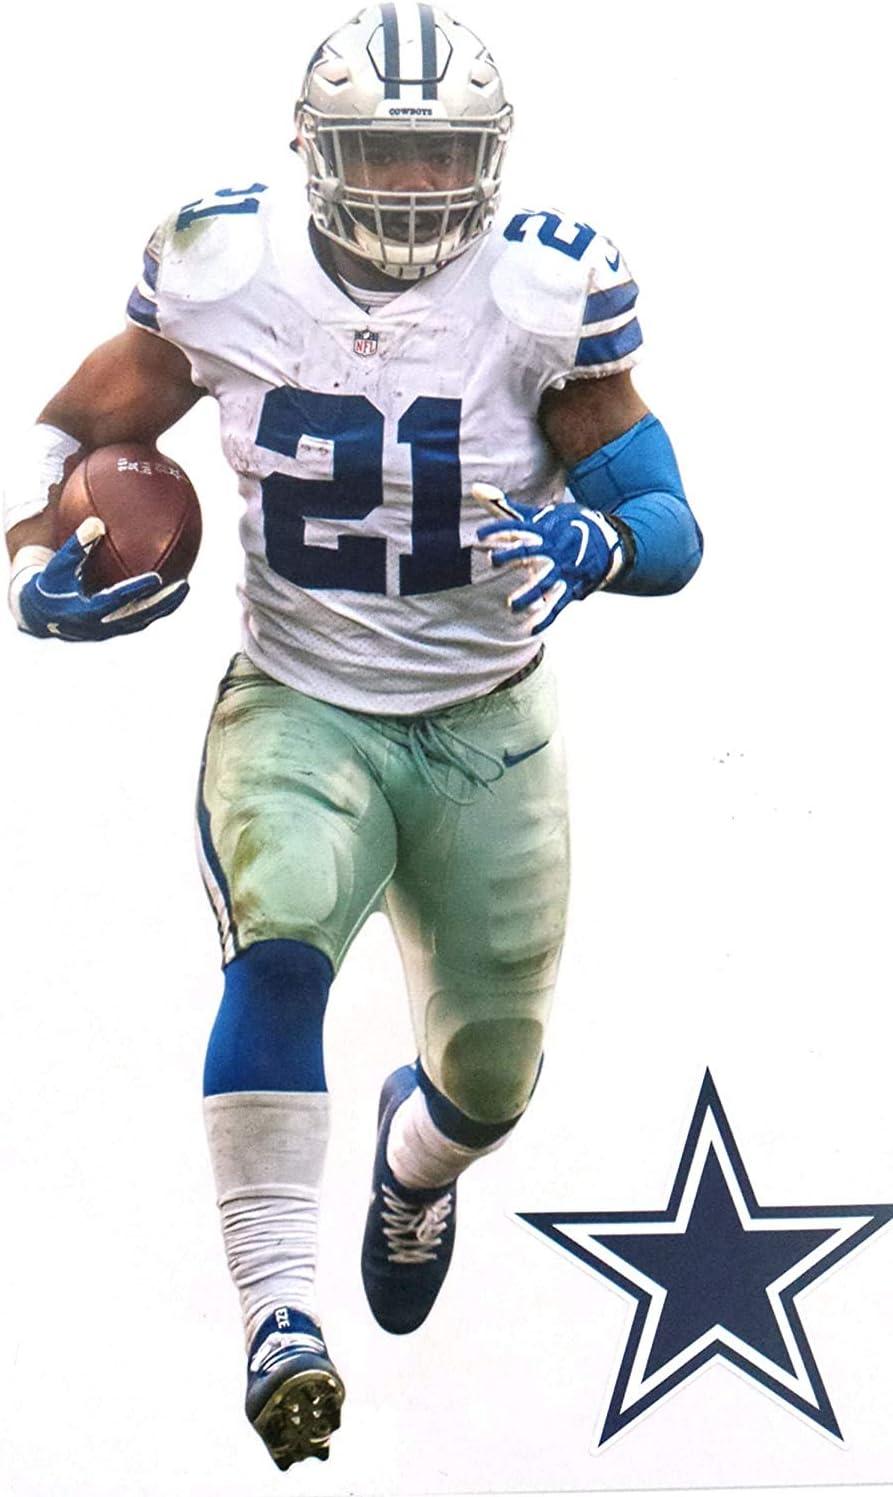 FATHEAD Ezekiel Elliott Mini Graphic + Cowboys Logo Official Vinyl Wall Graphics - This Graphic is 7